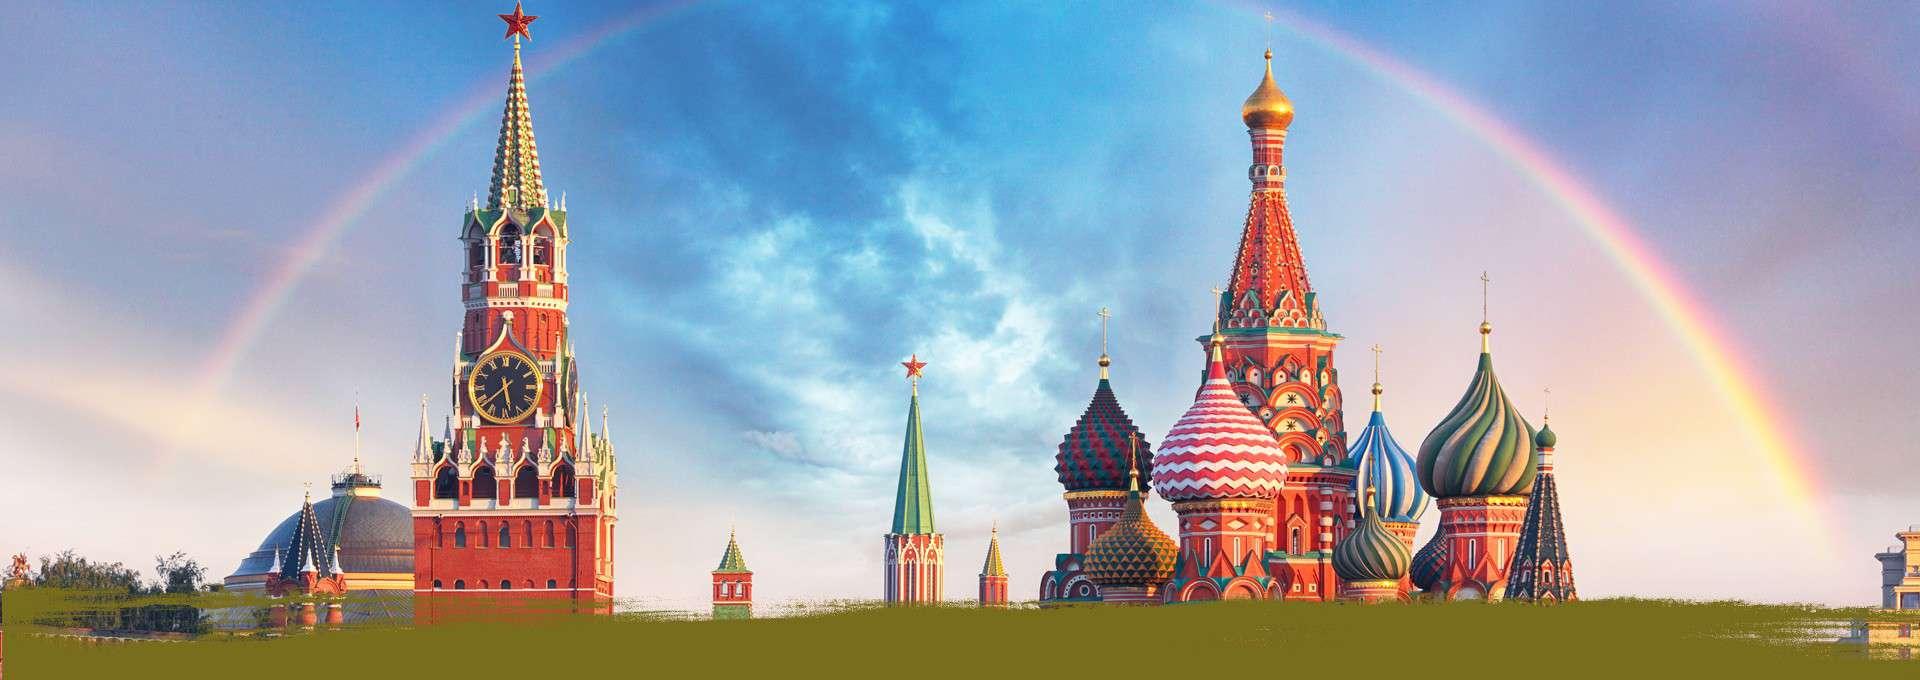 Reise 2 Russland 1+